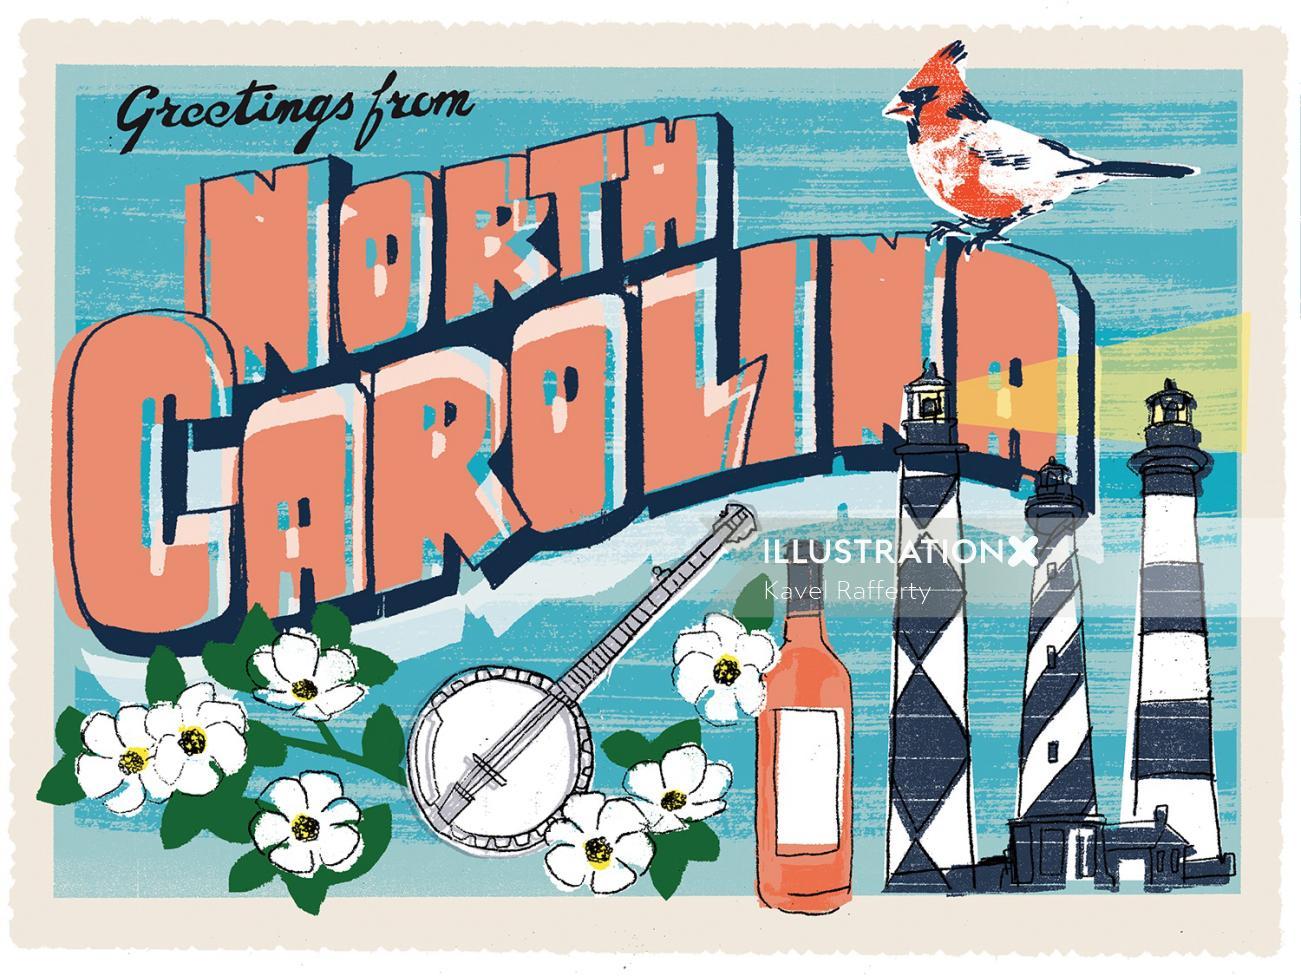 North Carolina Postcard Design By Kavel Rafferty Illustrator